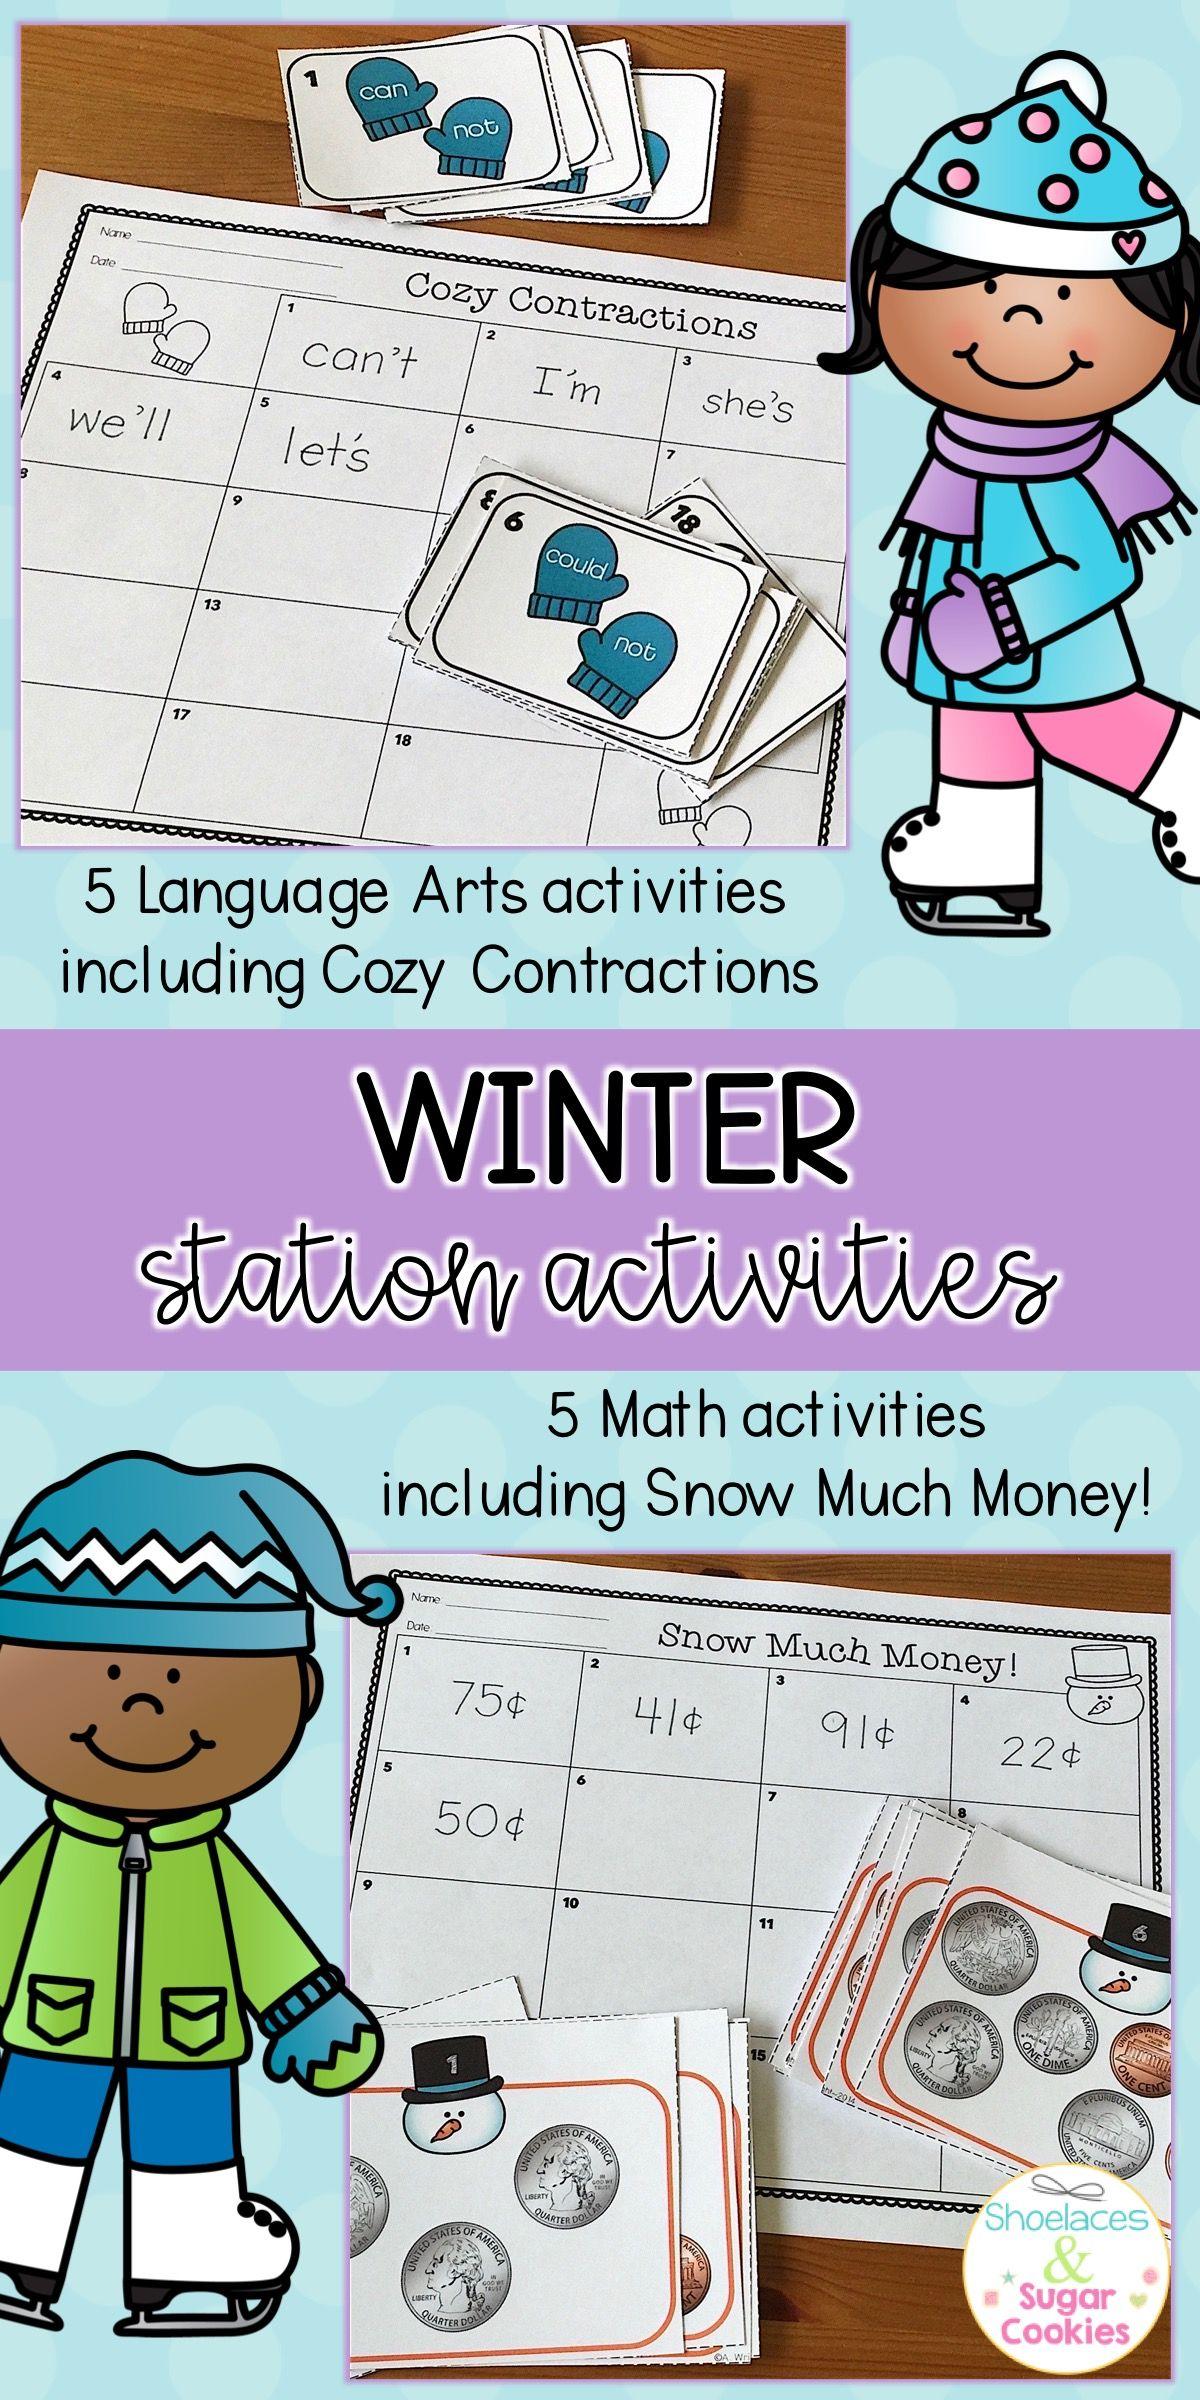 Winter Activities | Math activities, Language arts and Math